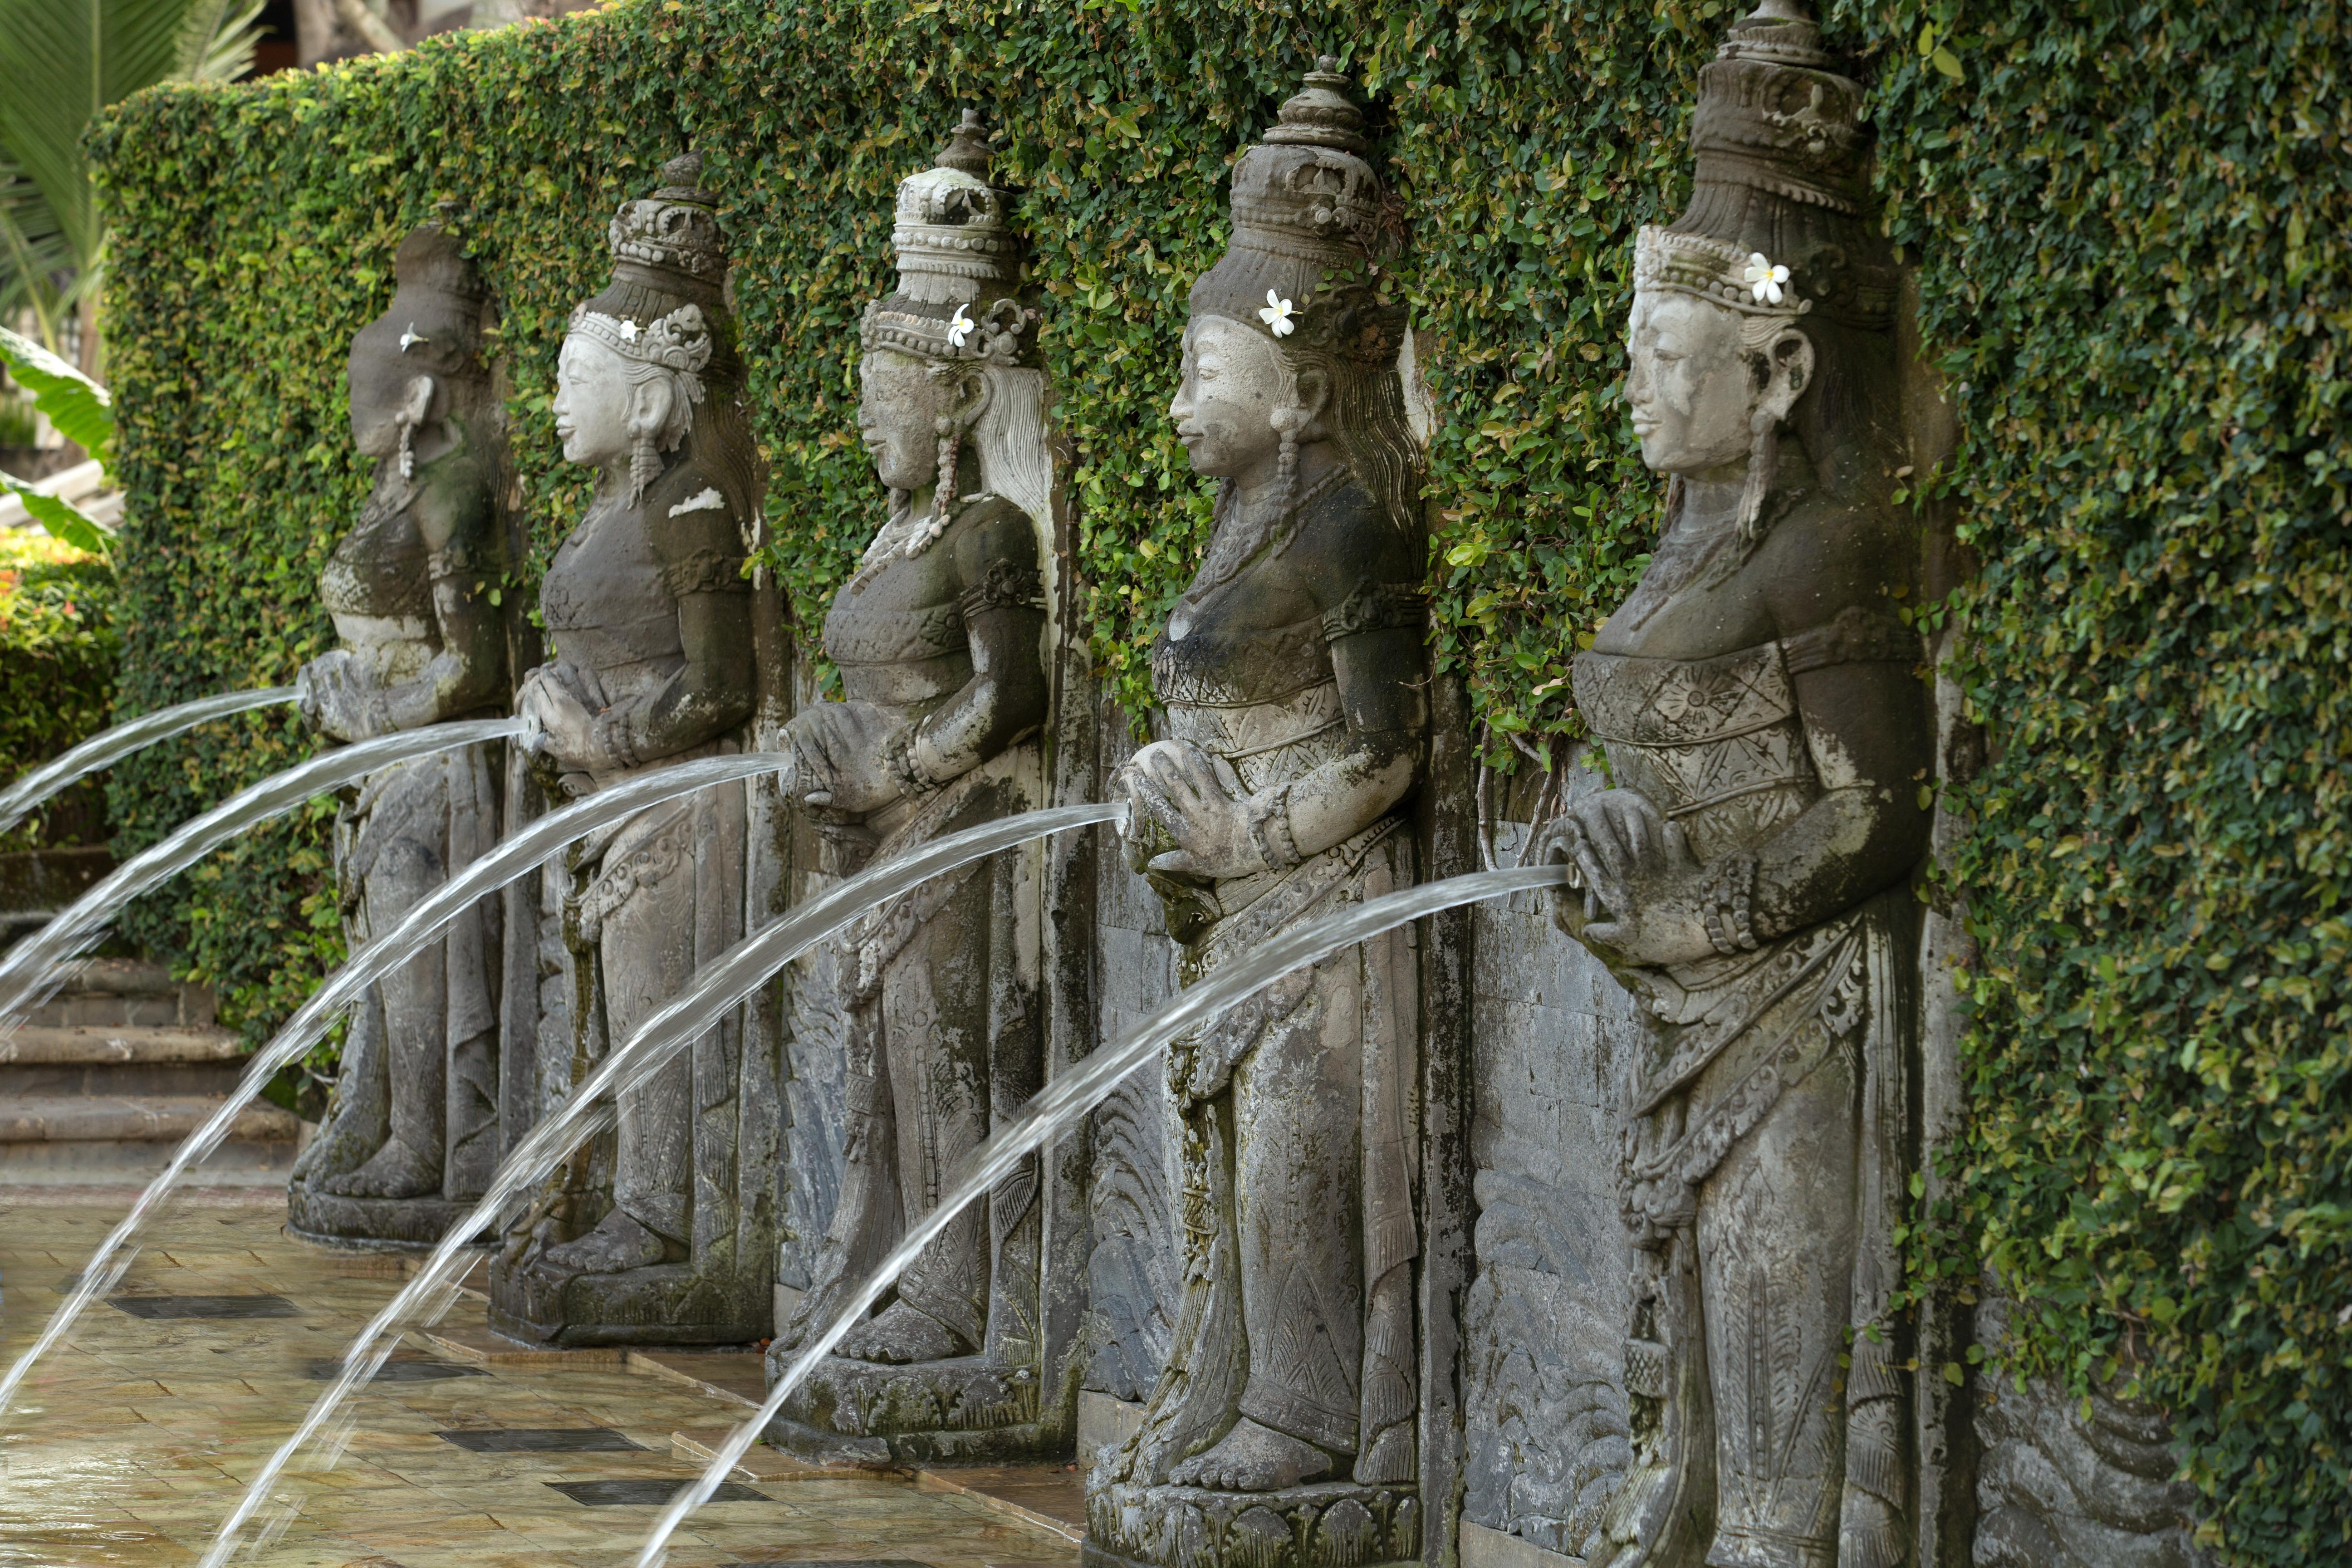 Resort Sculpture: Lima Dewi (The Five Goddess)